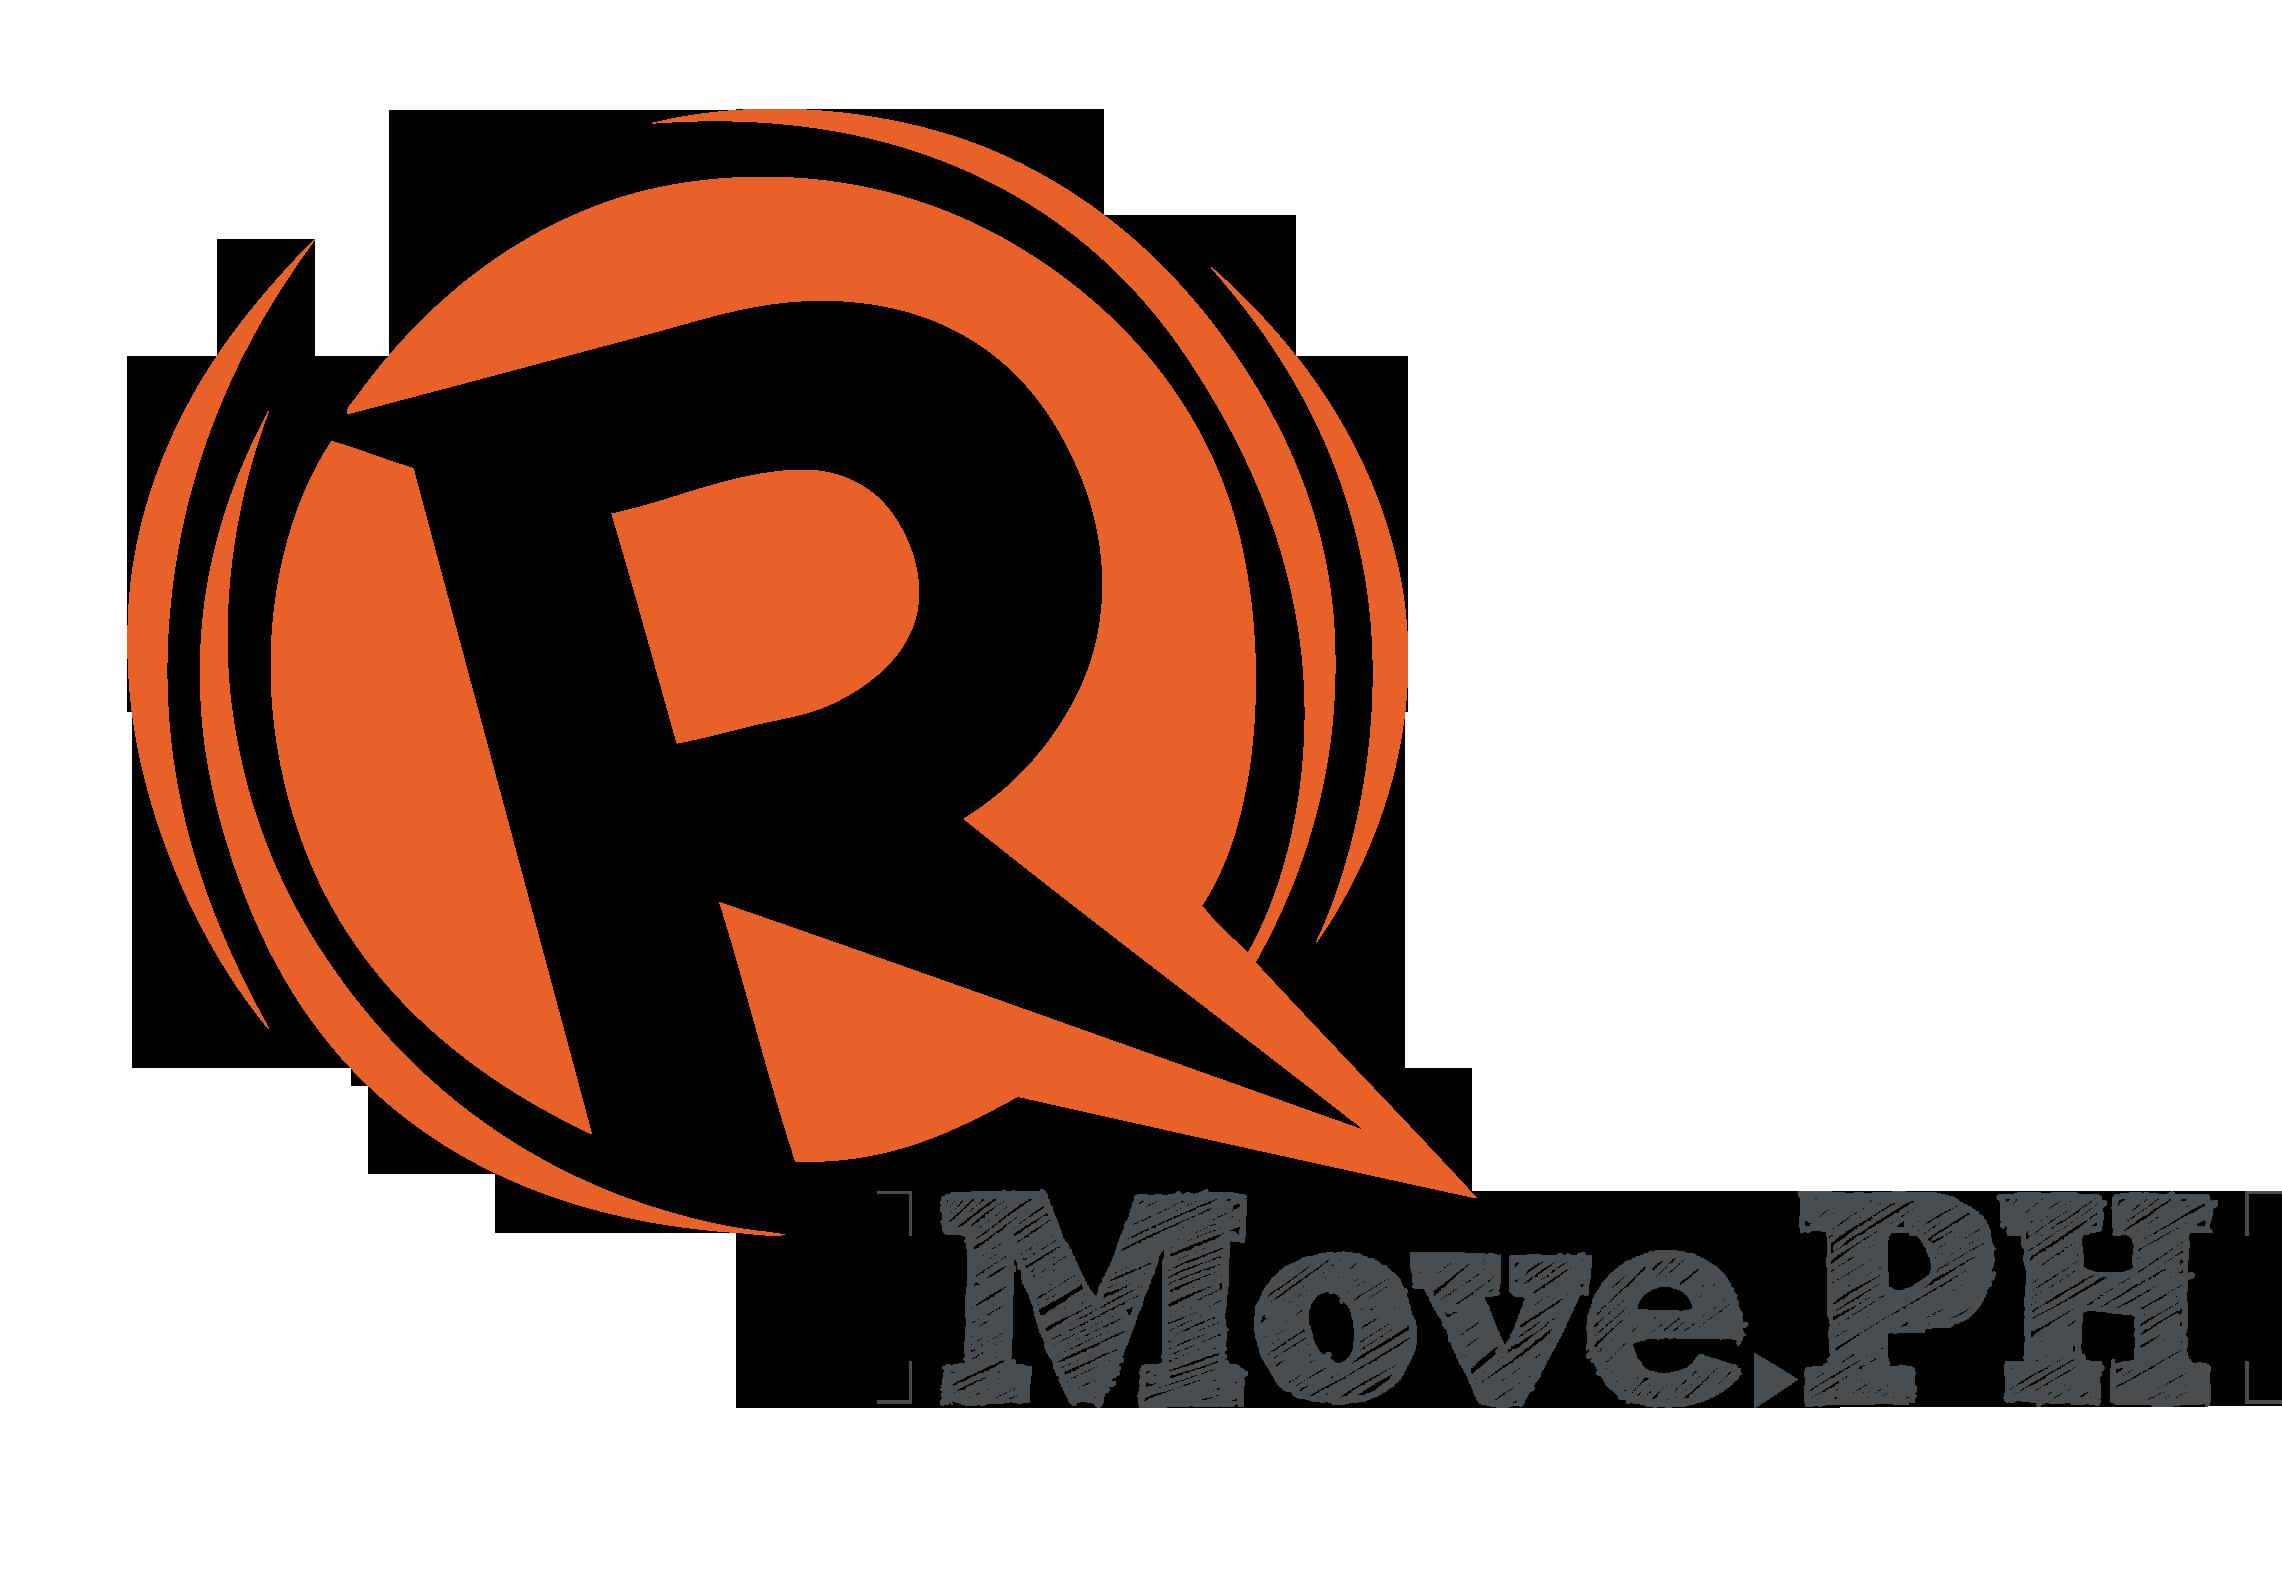 Rappler MovePH